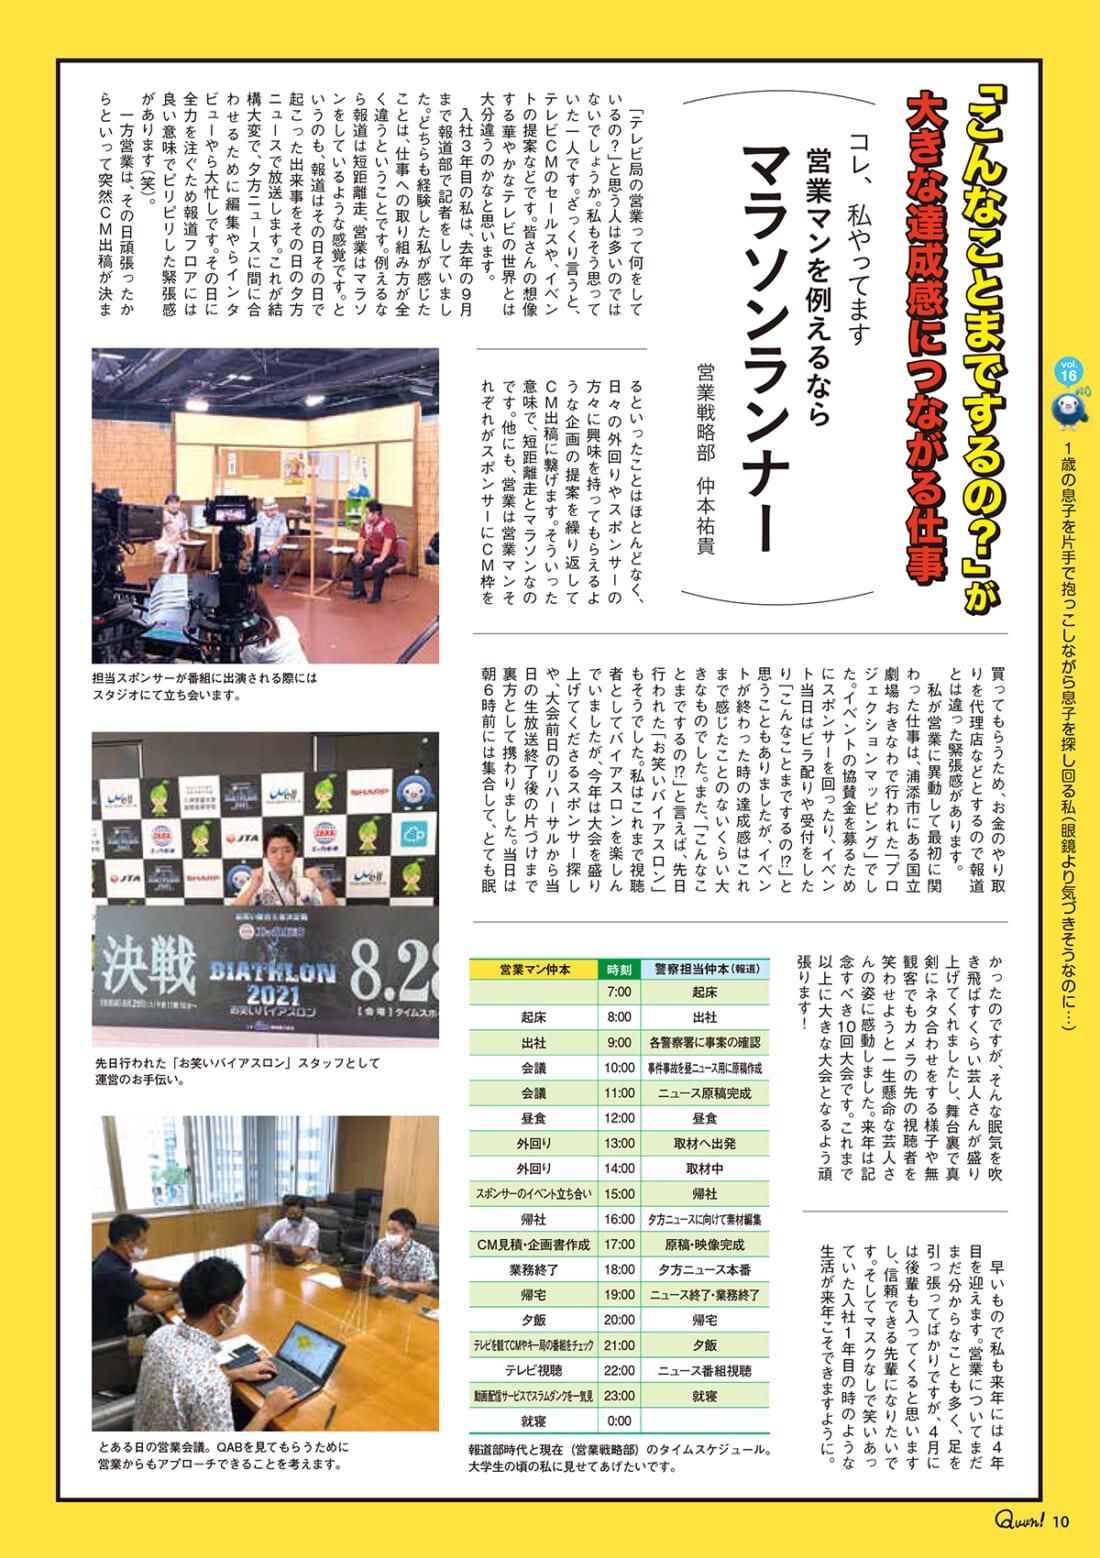 https://www.qab.co.jp/qgoro/wp-content/uploads/quun_1612-1100x1558.jpg